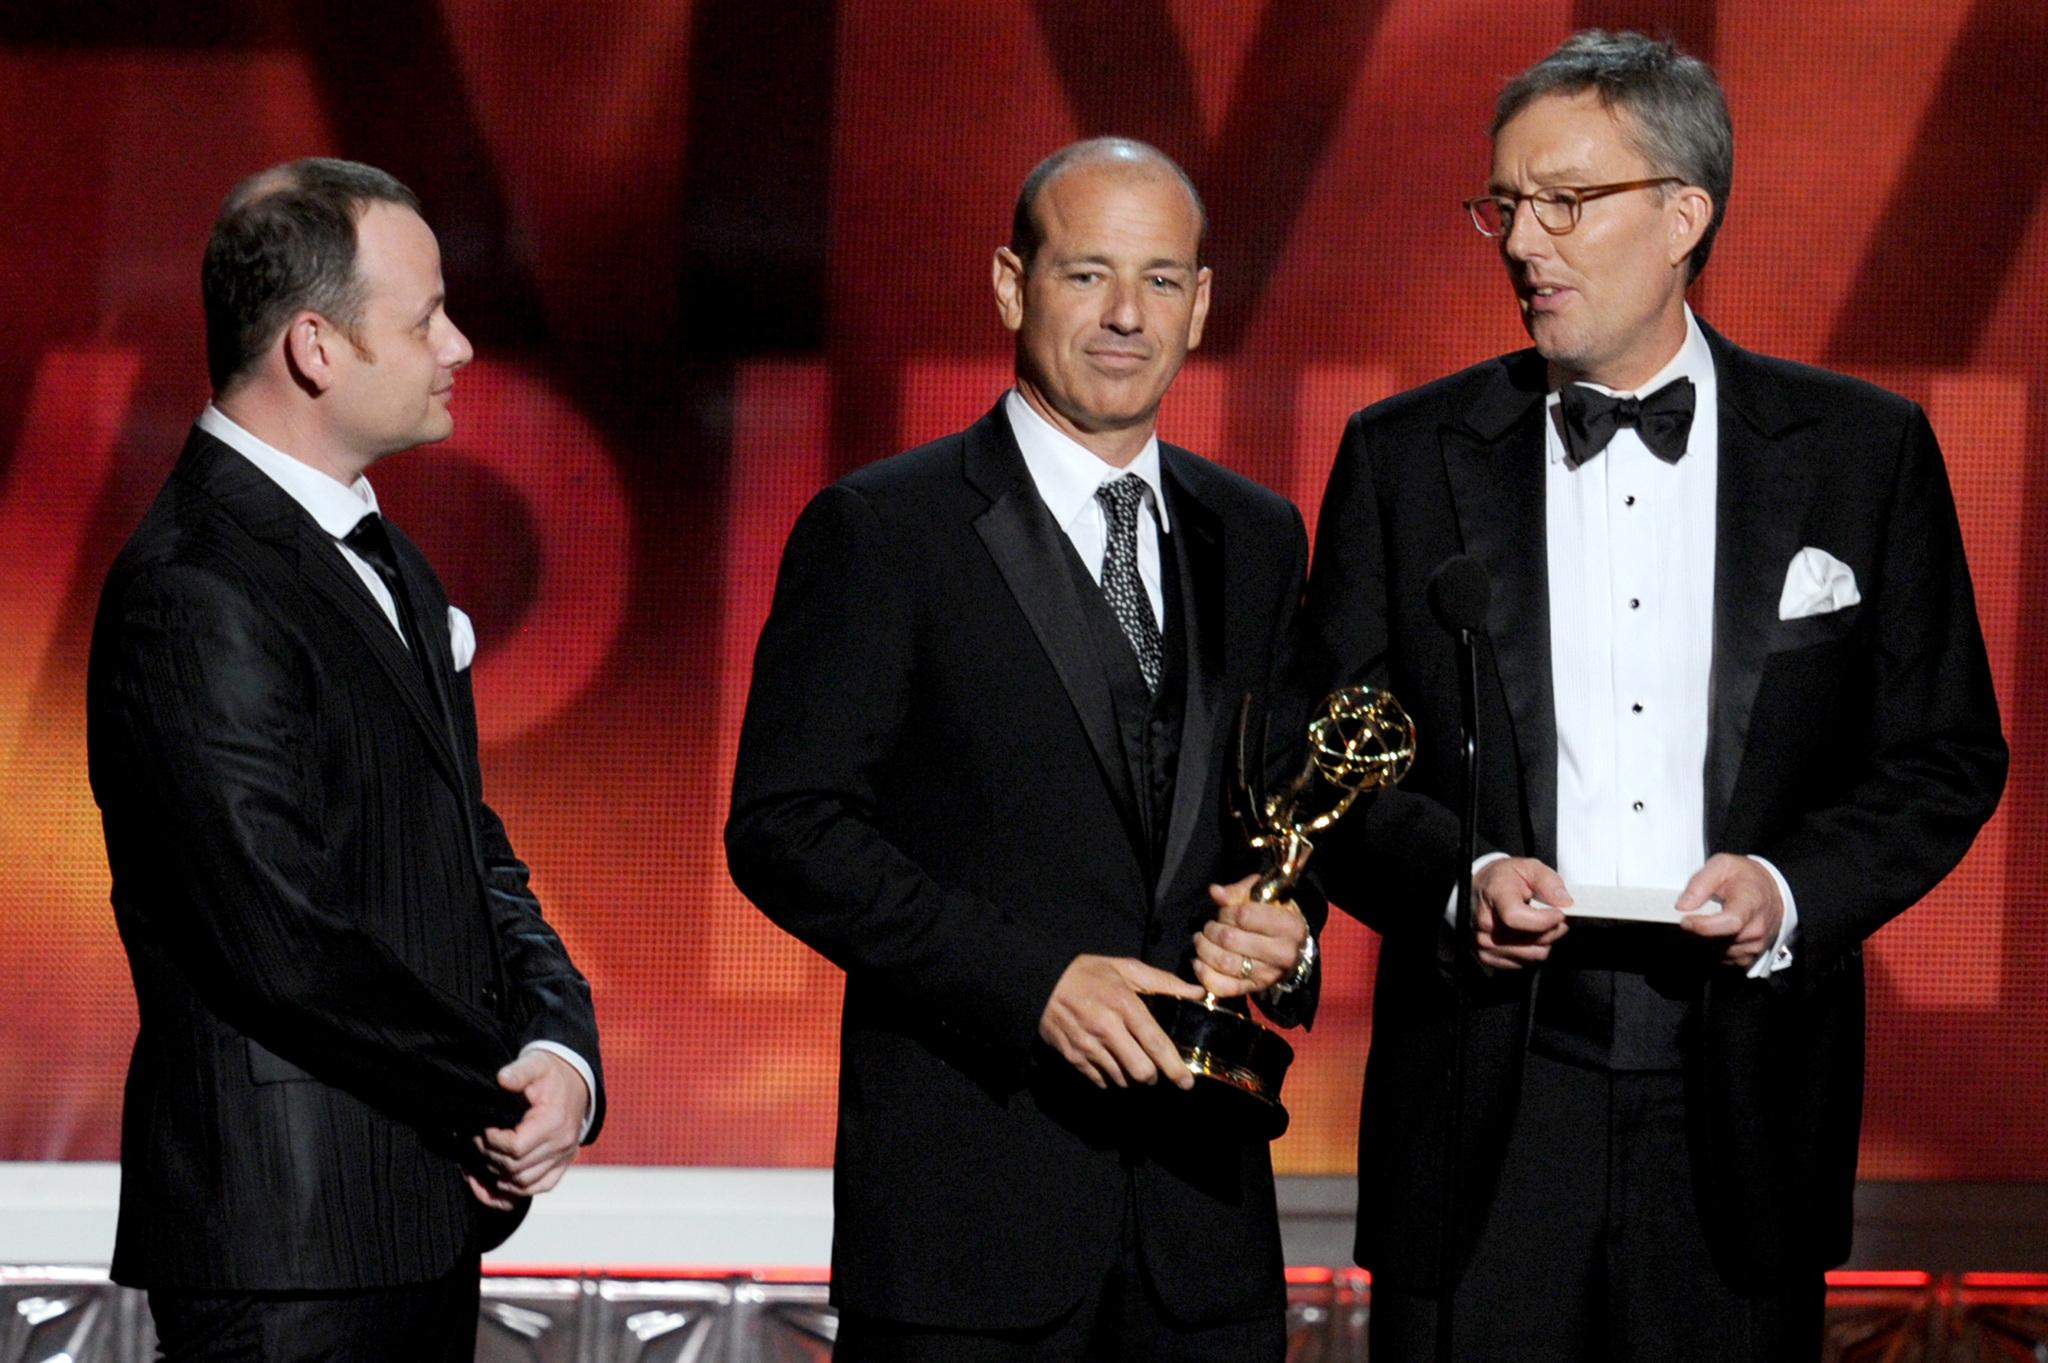 Alex Gansa, Howard Gordon and Gideon Raff at event of The 64th Primetime Emmy Awards (2012)